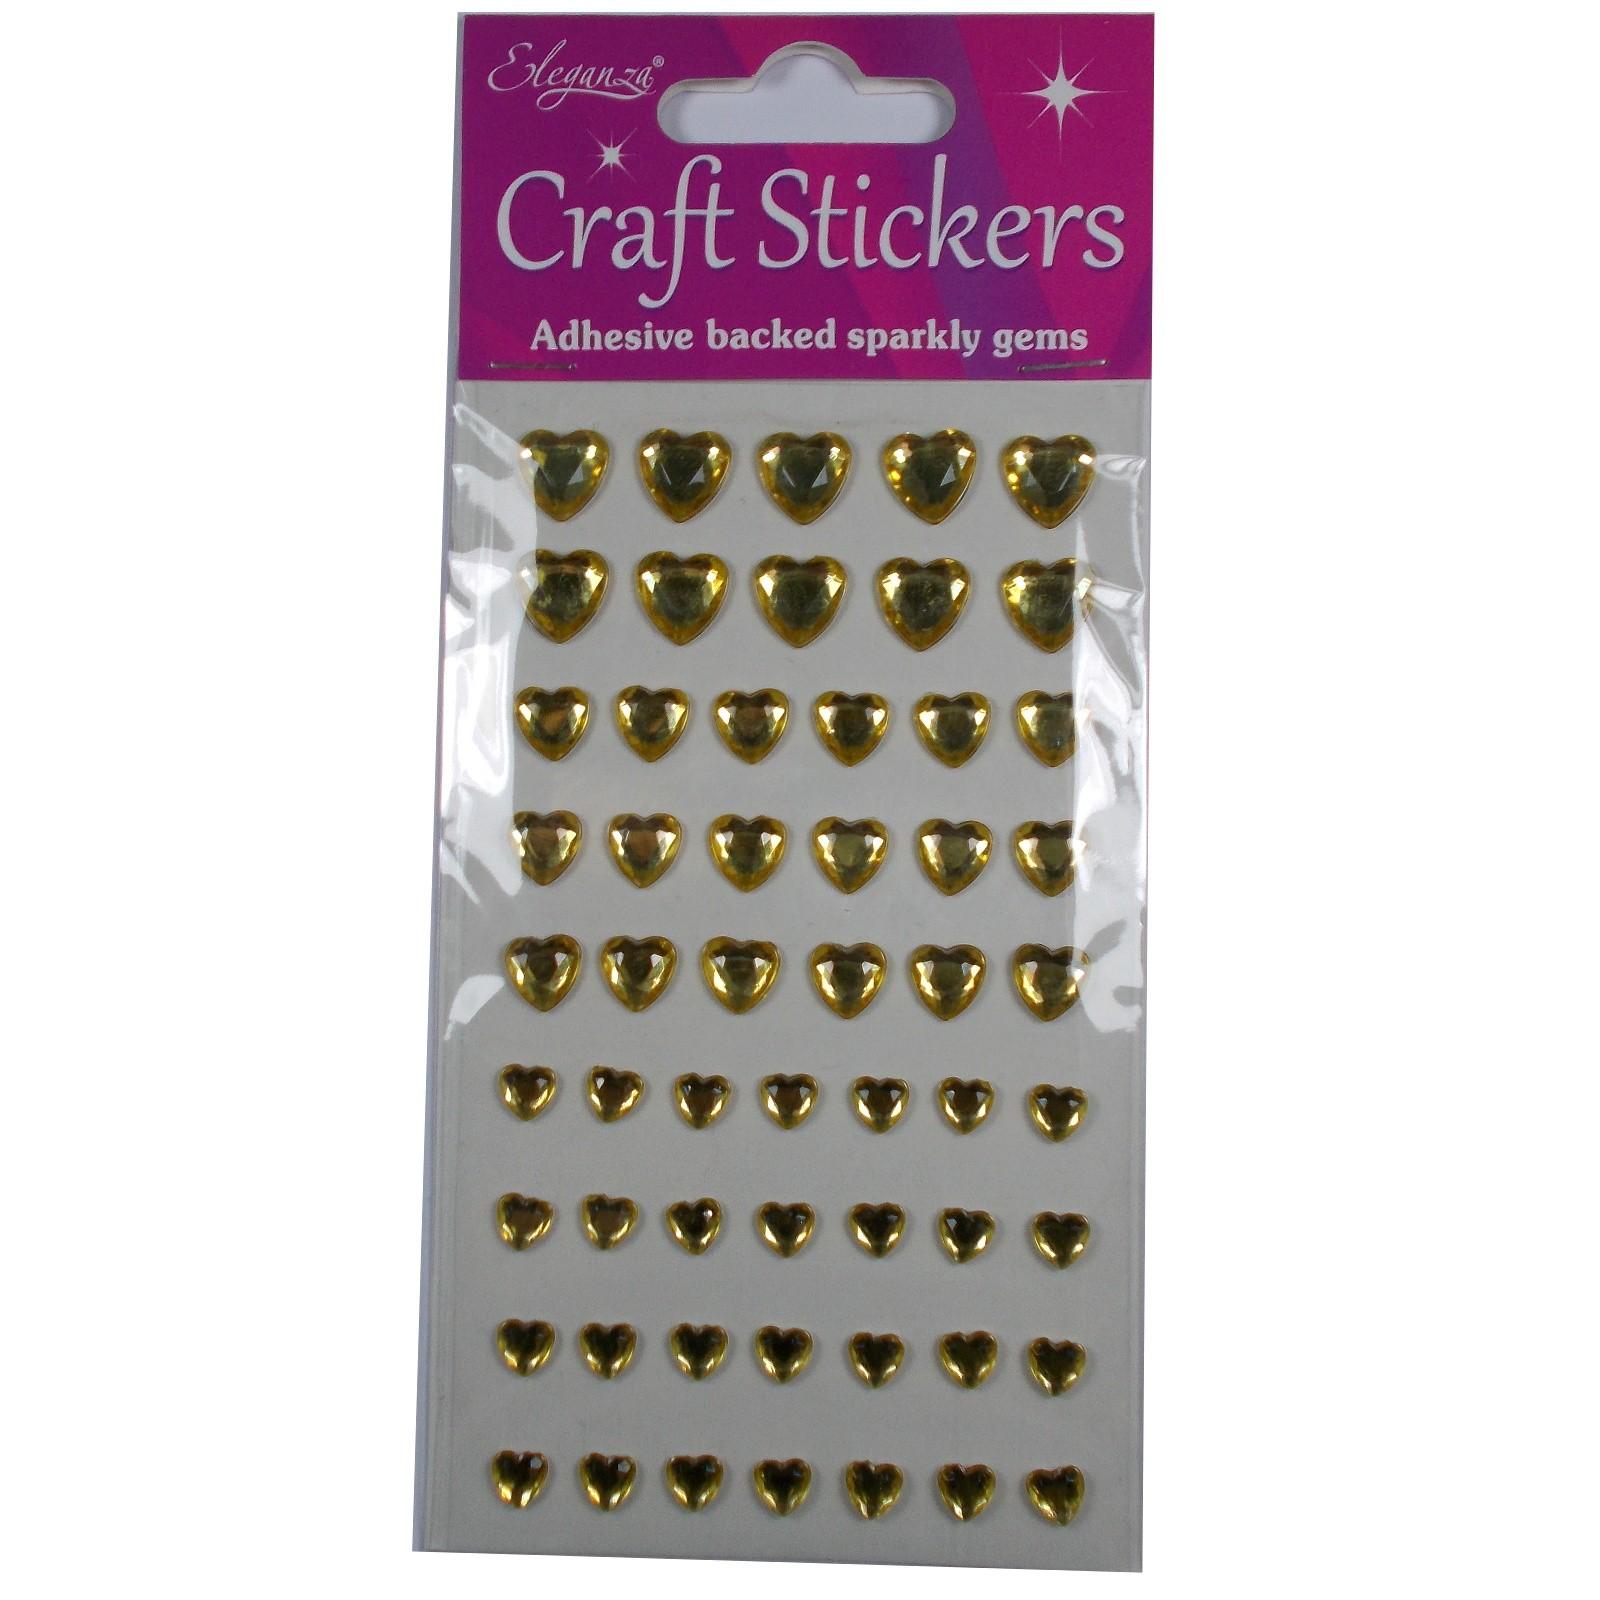 Craft Stickers 6mm - 10mm Heart Diamante Gold